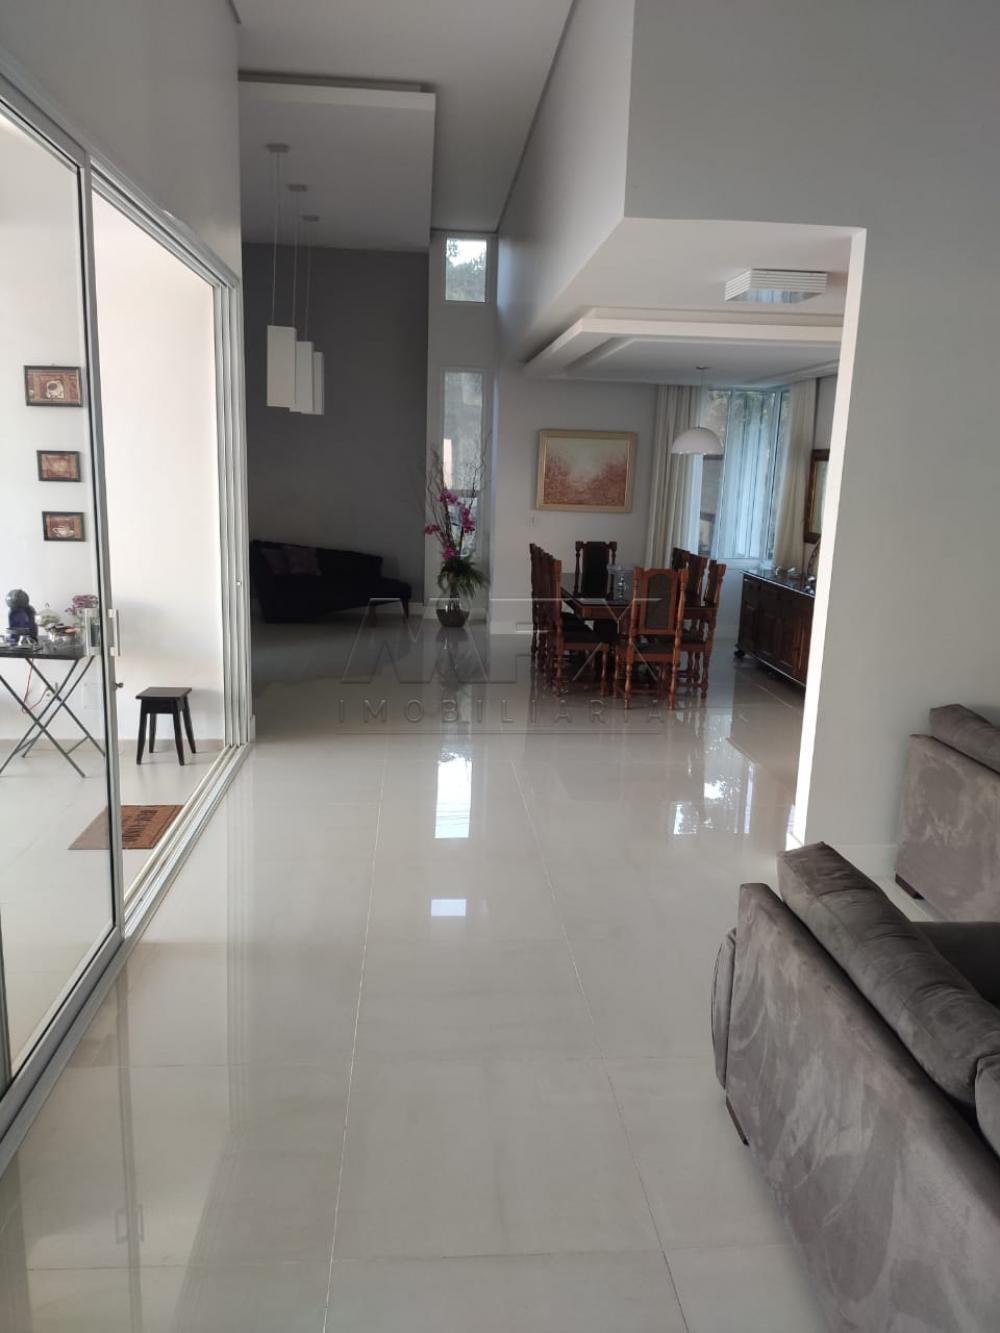 Comprar Casa / Condomínio em Bauru apenas R$ 1.800.000,00 - Foto 9